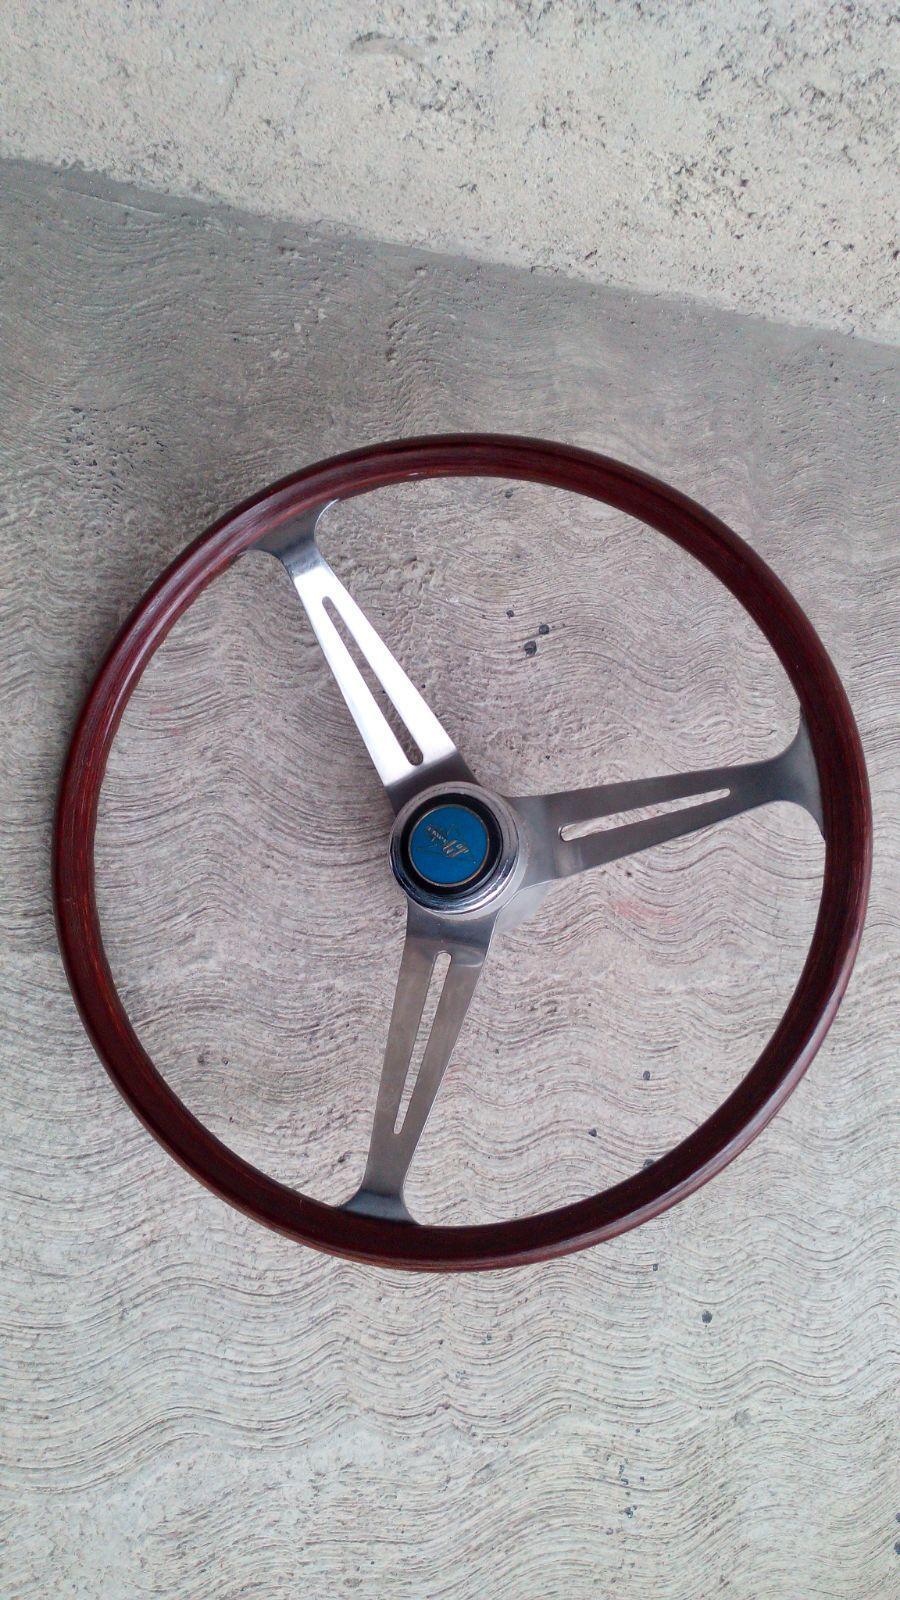 Empi gtv steering wheel 60's